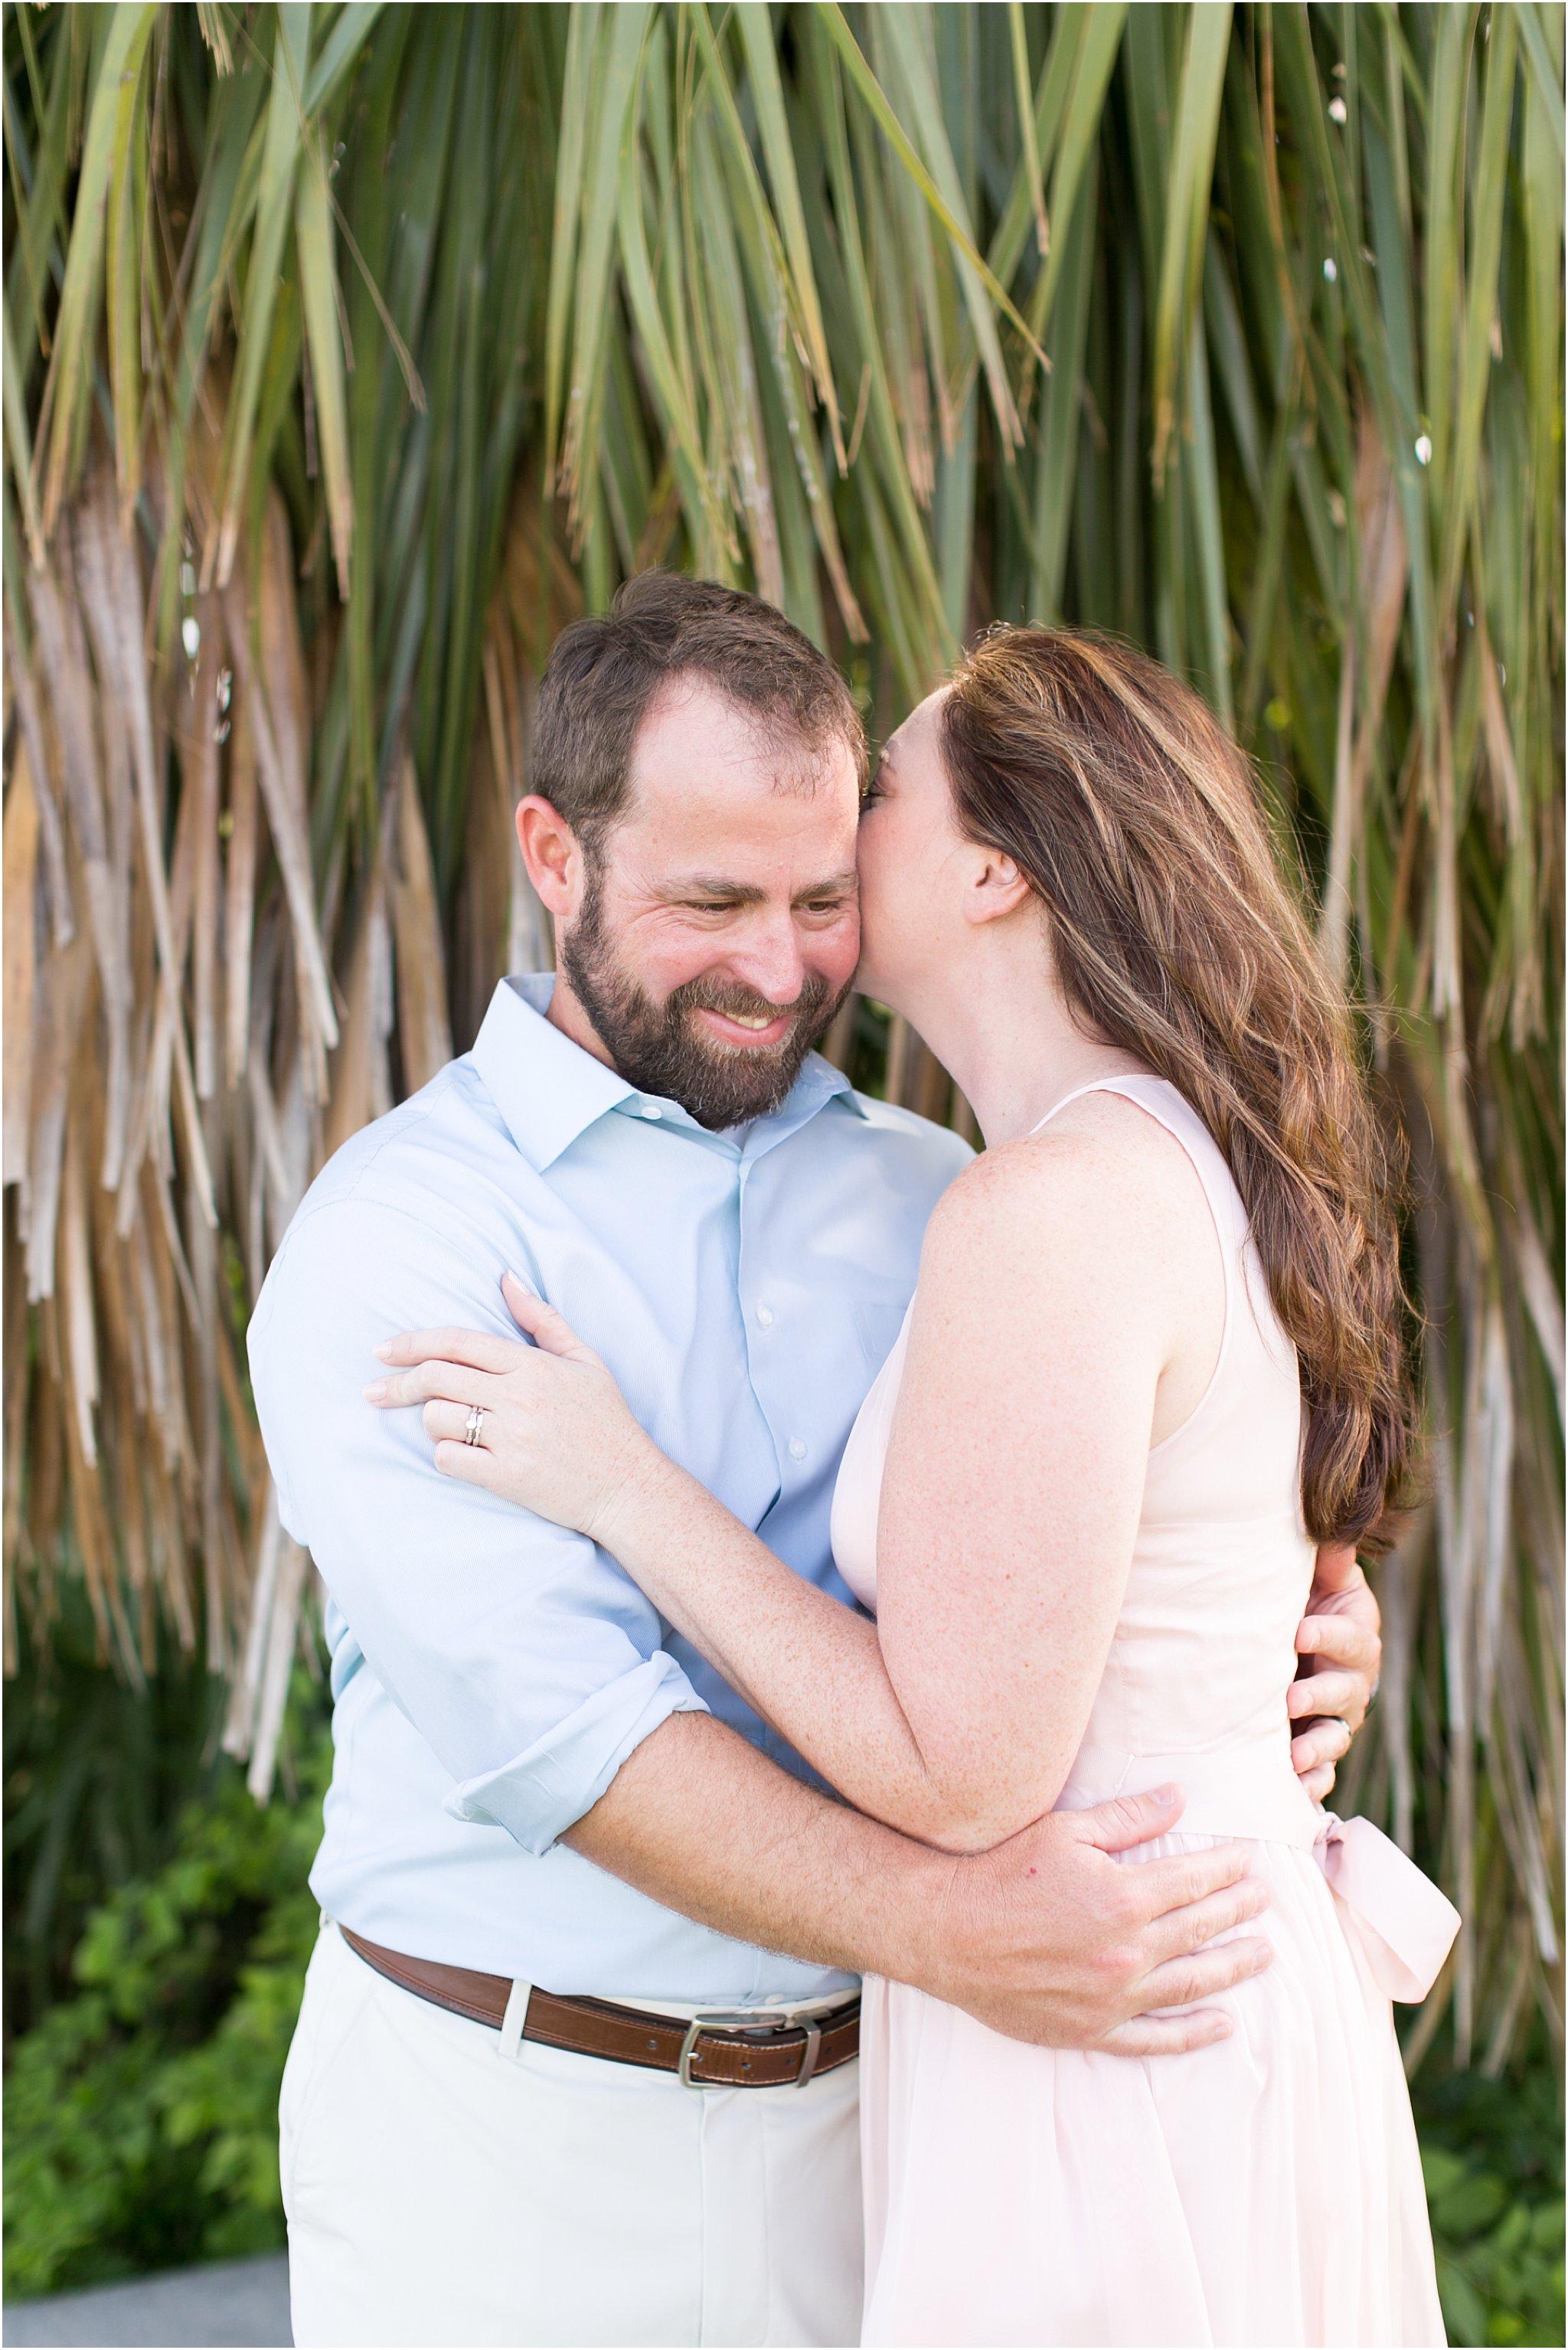 jessica_ryan_photography_wedding_photographs_virginia_fernandina_beach_florida_wedding_2118